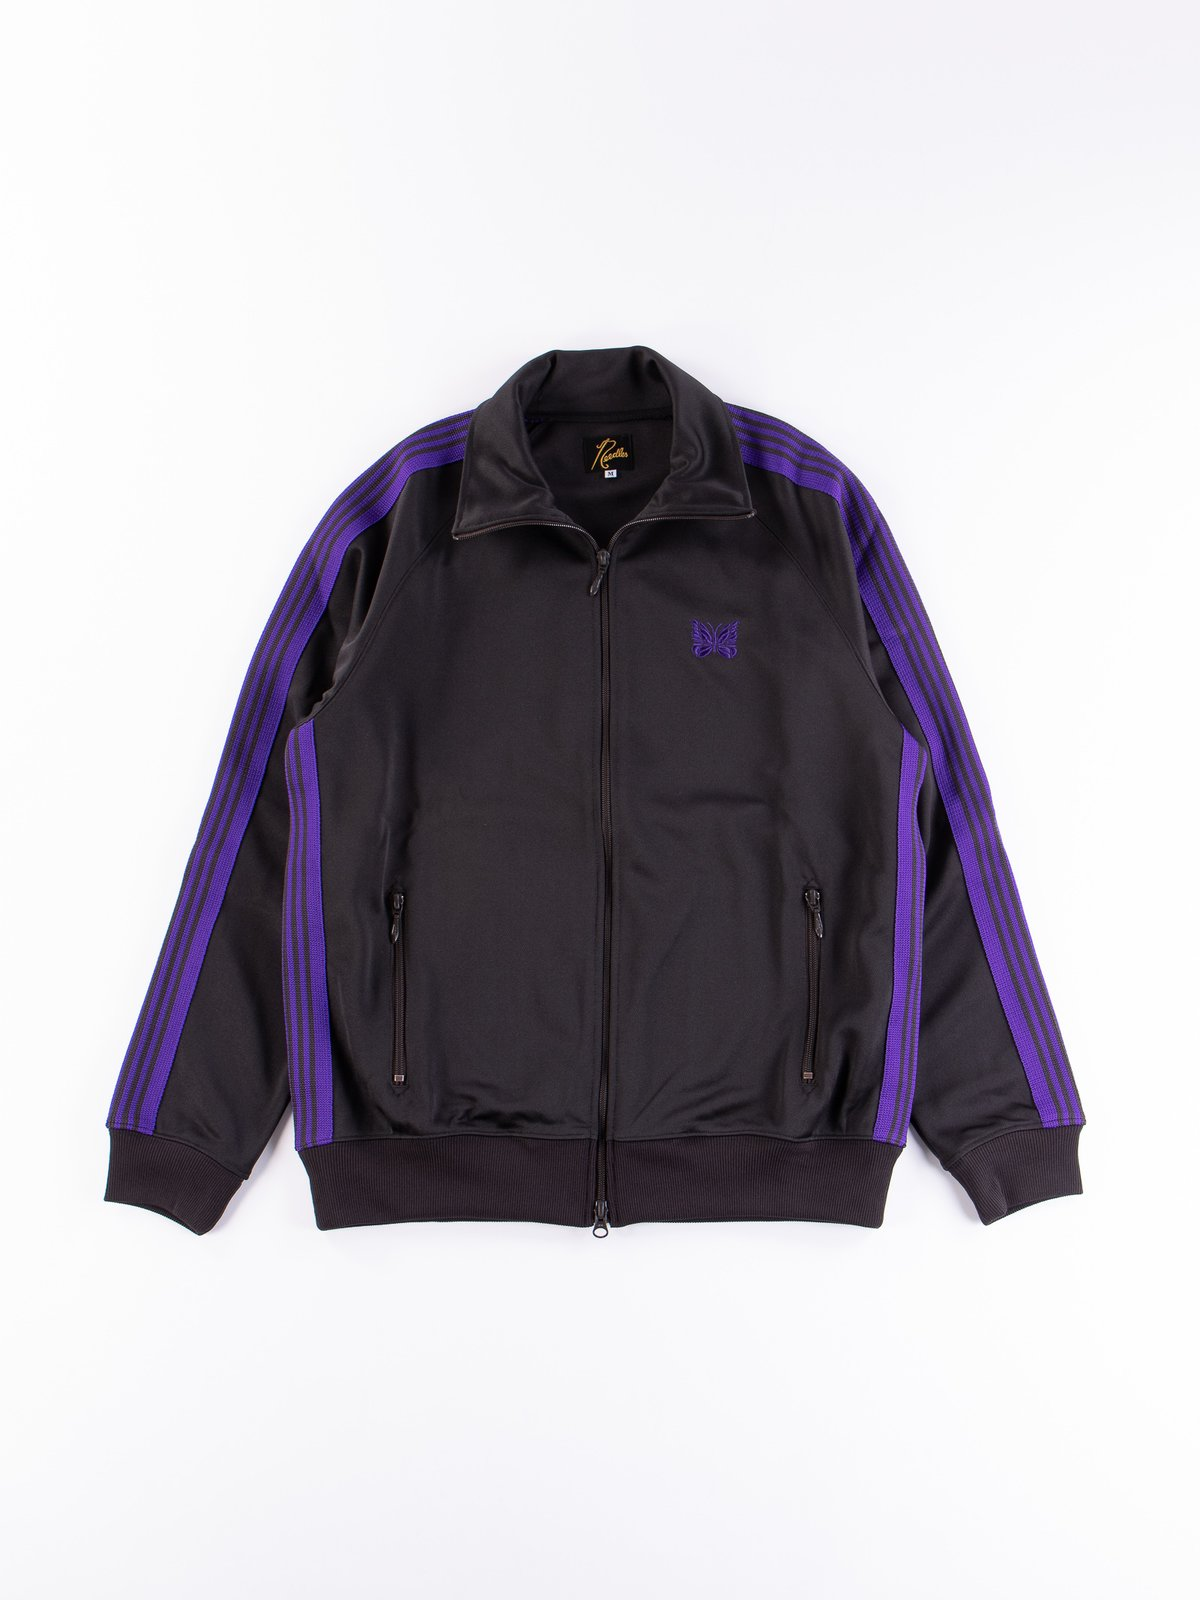 Charcoal Track Jacket - Image 1